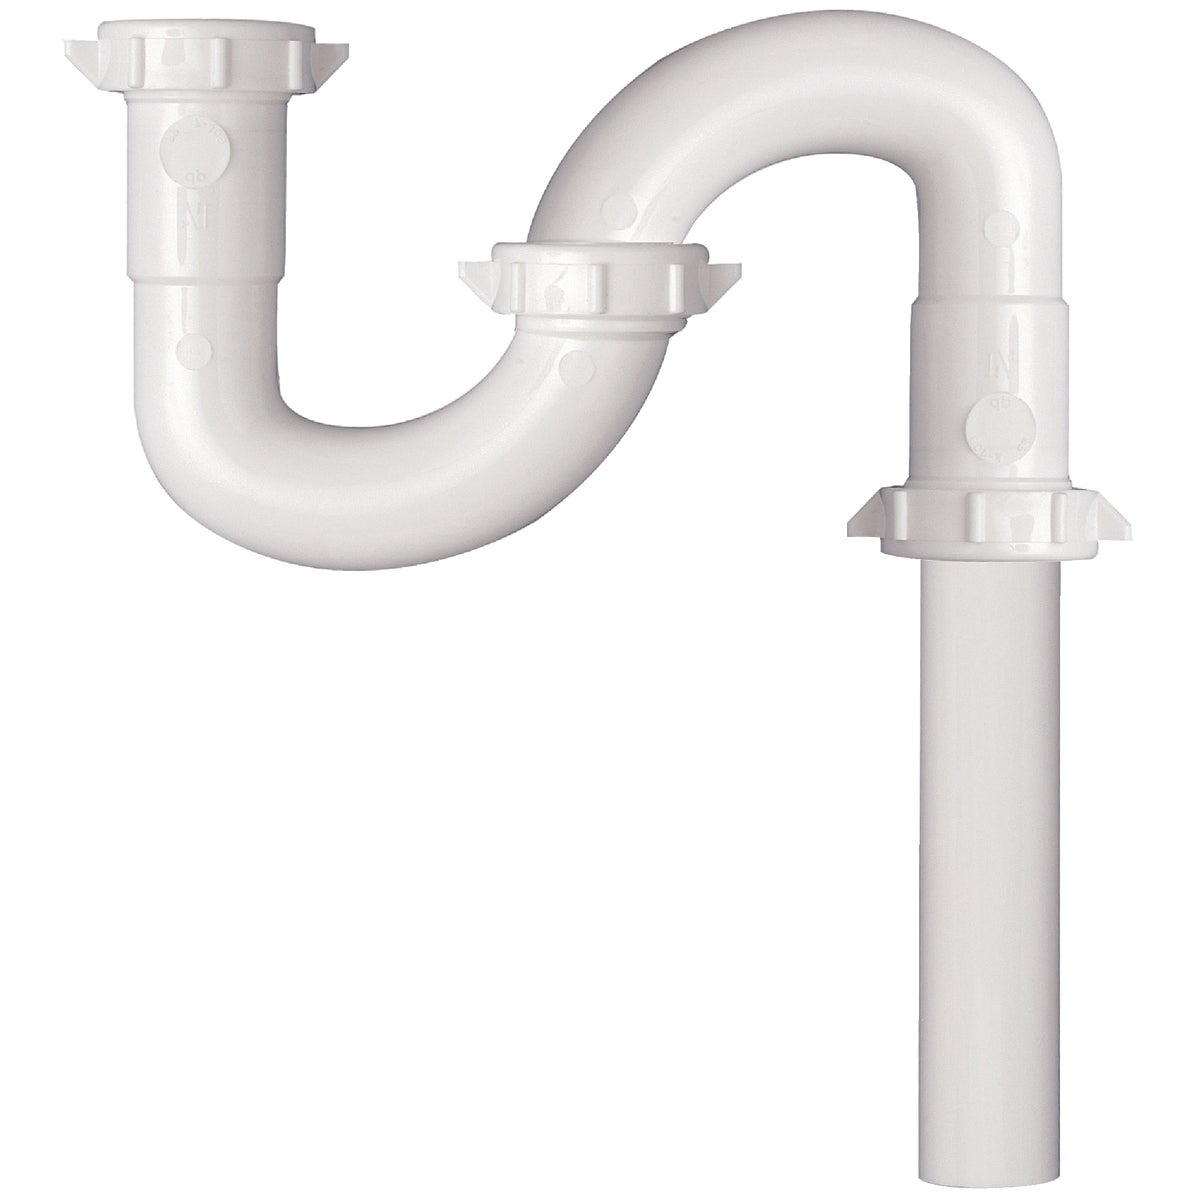 1-1/4 WHT PLASTIC S-TRAP - 443824 by Plumb Pak/keeney Mfg